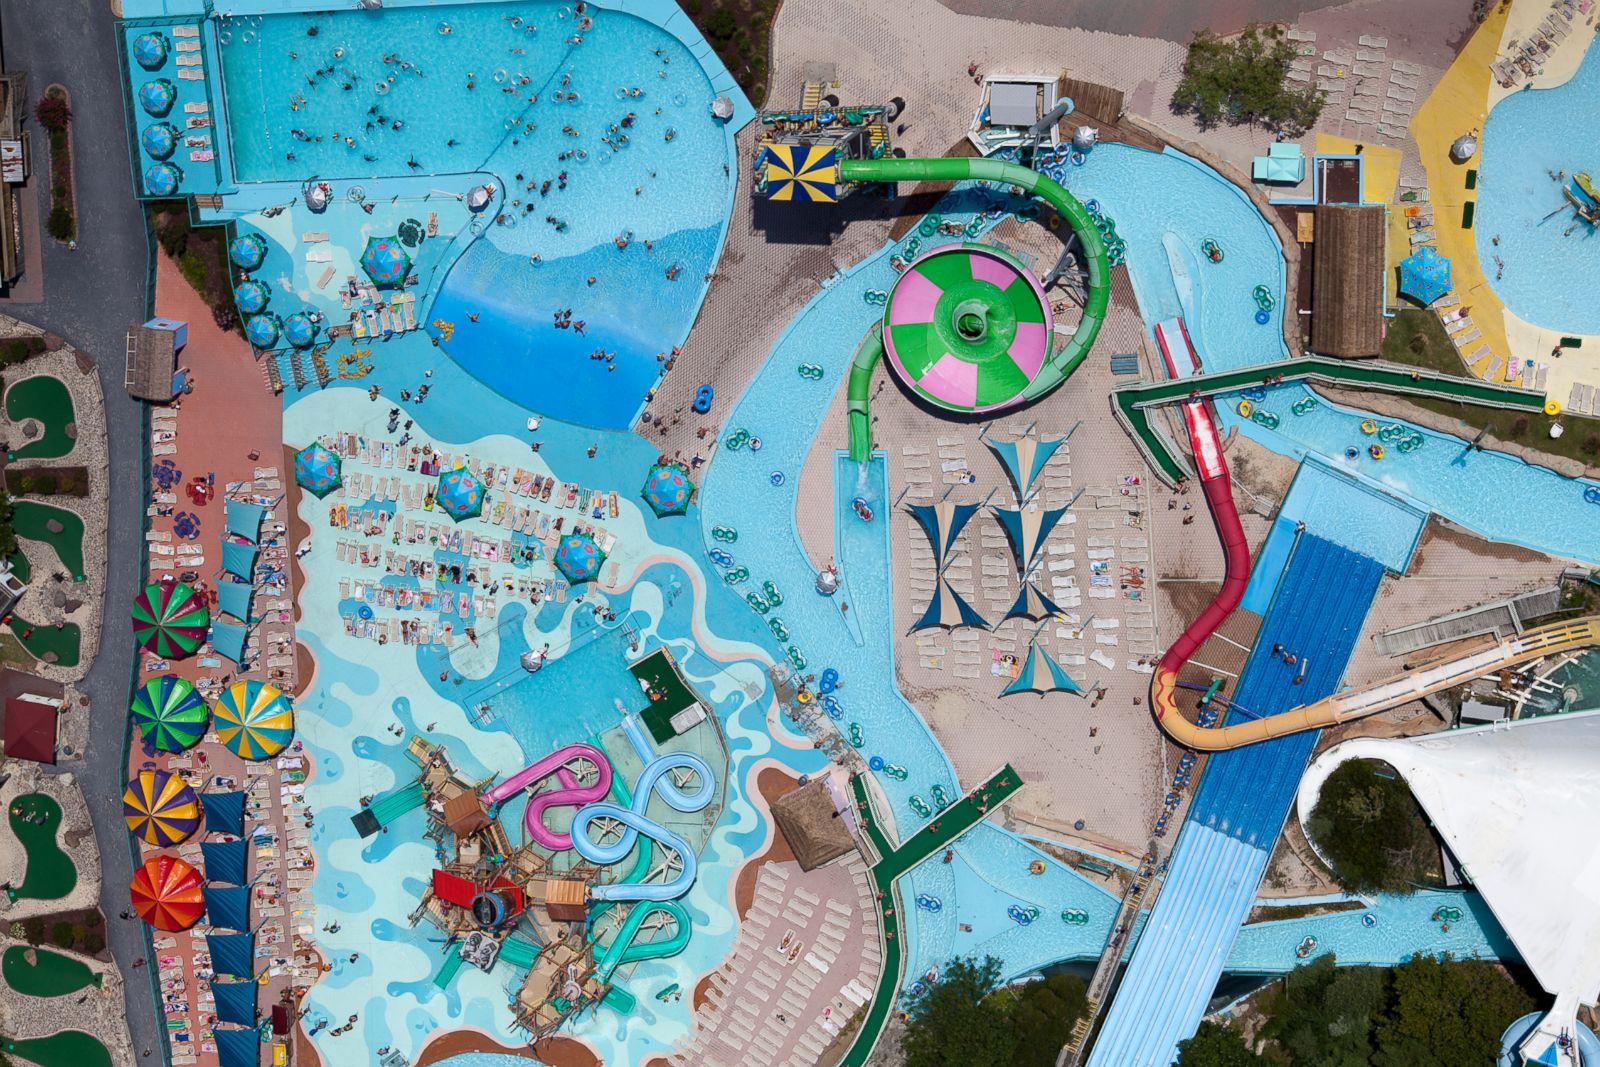 Ocean City Amusement Park in Ocean City, Maryland